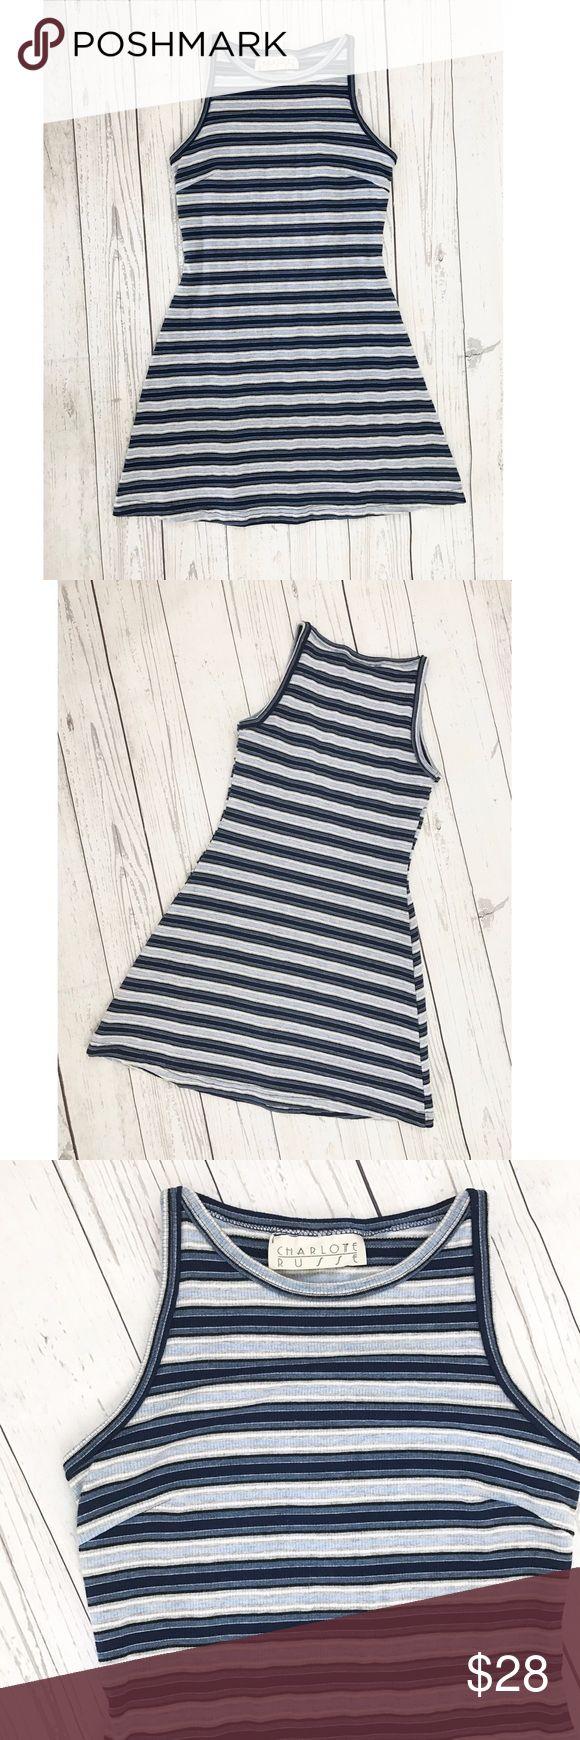 Vintage Dress Striped stretchy mini dress. So cute!stripes are navy blue, powder blue, grey and silver. Vintage Dresses Mini